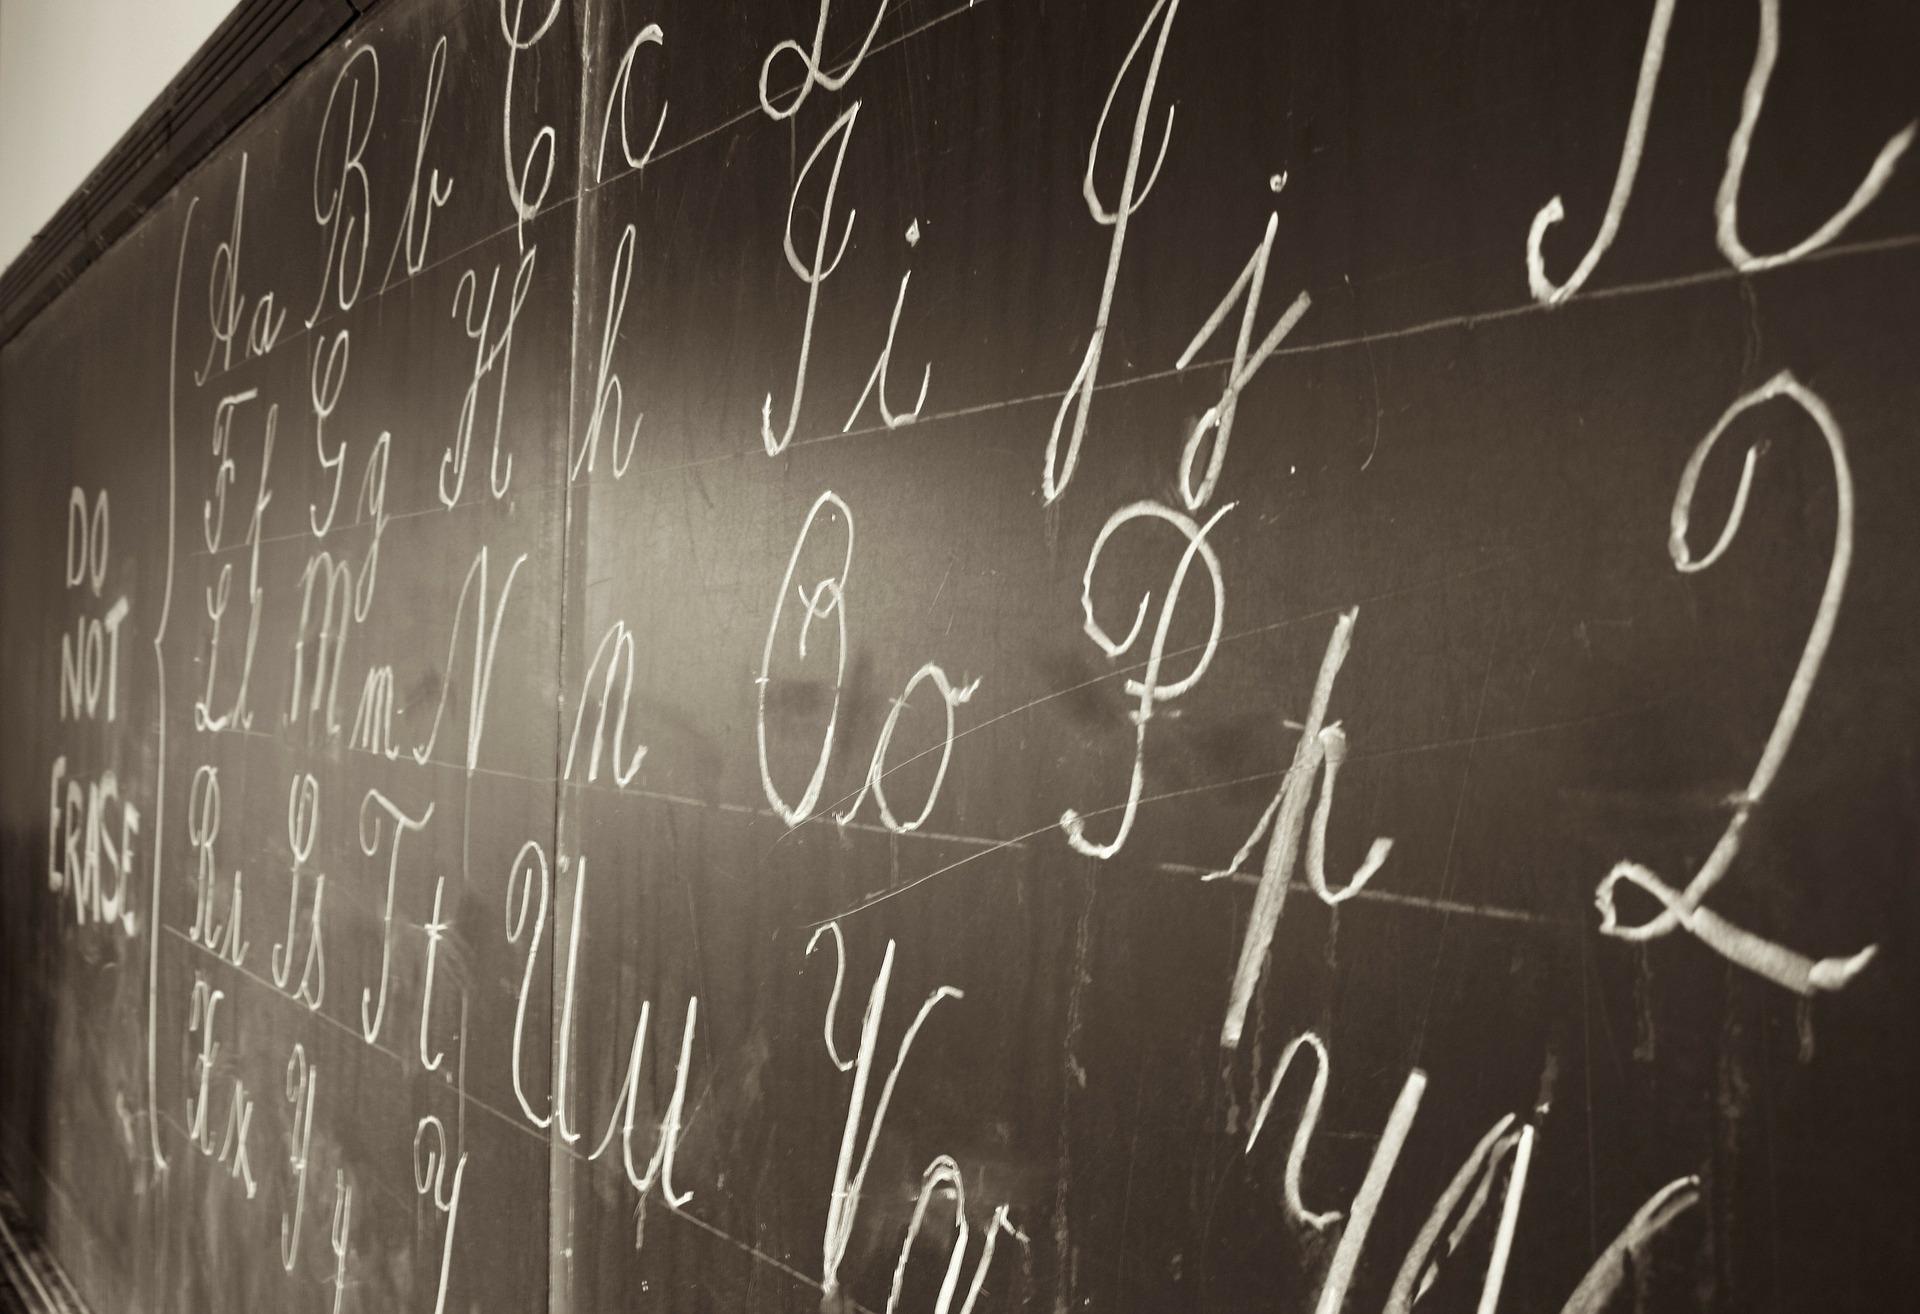 Linguistic Research Topics